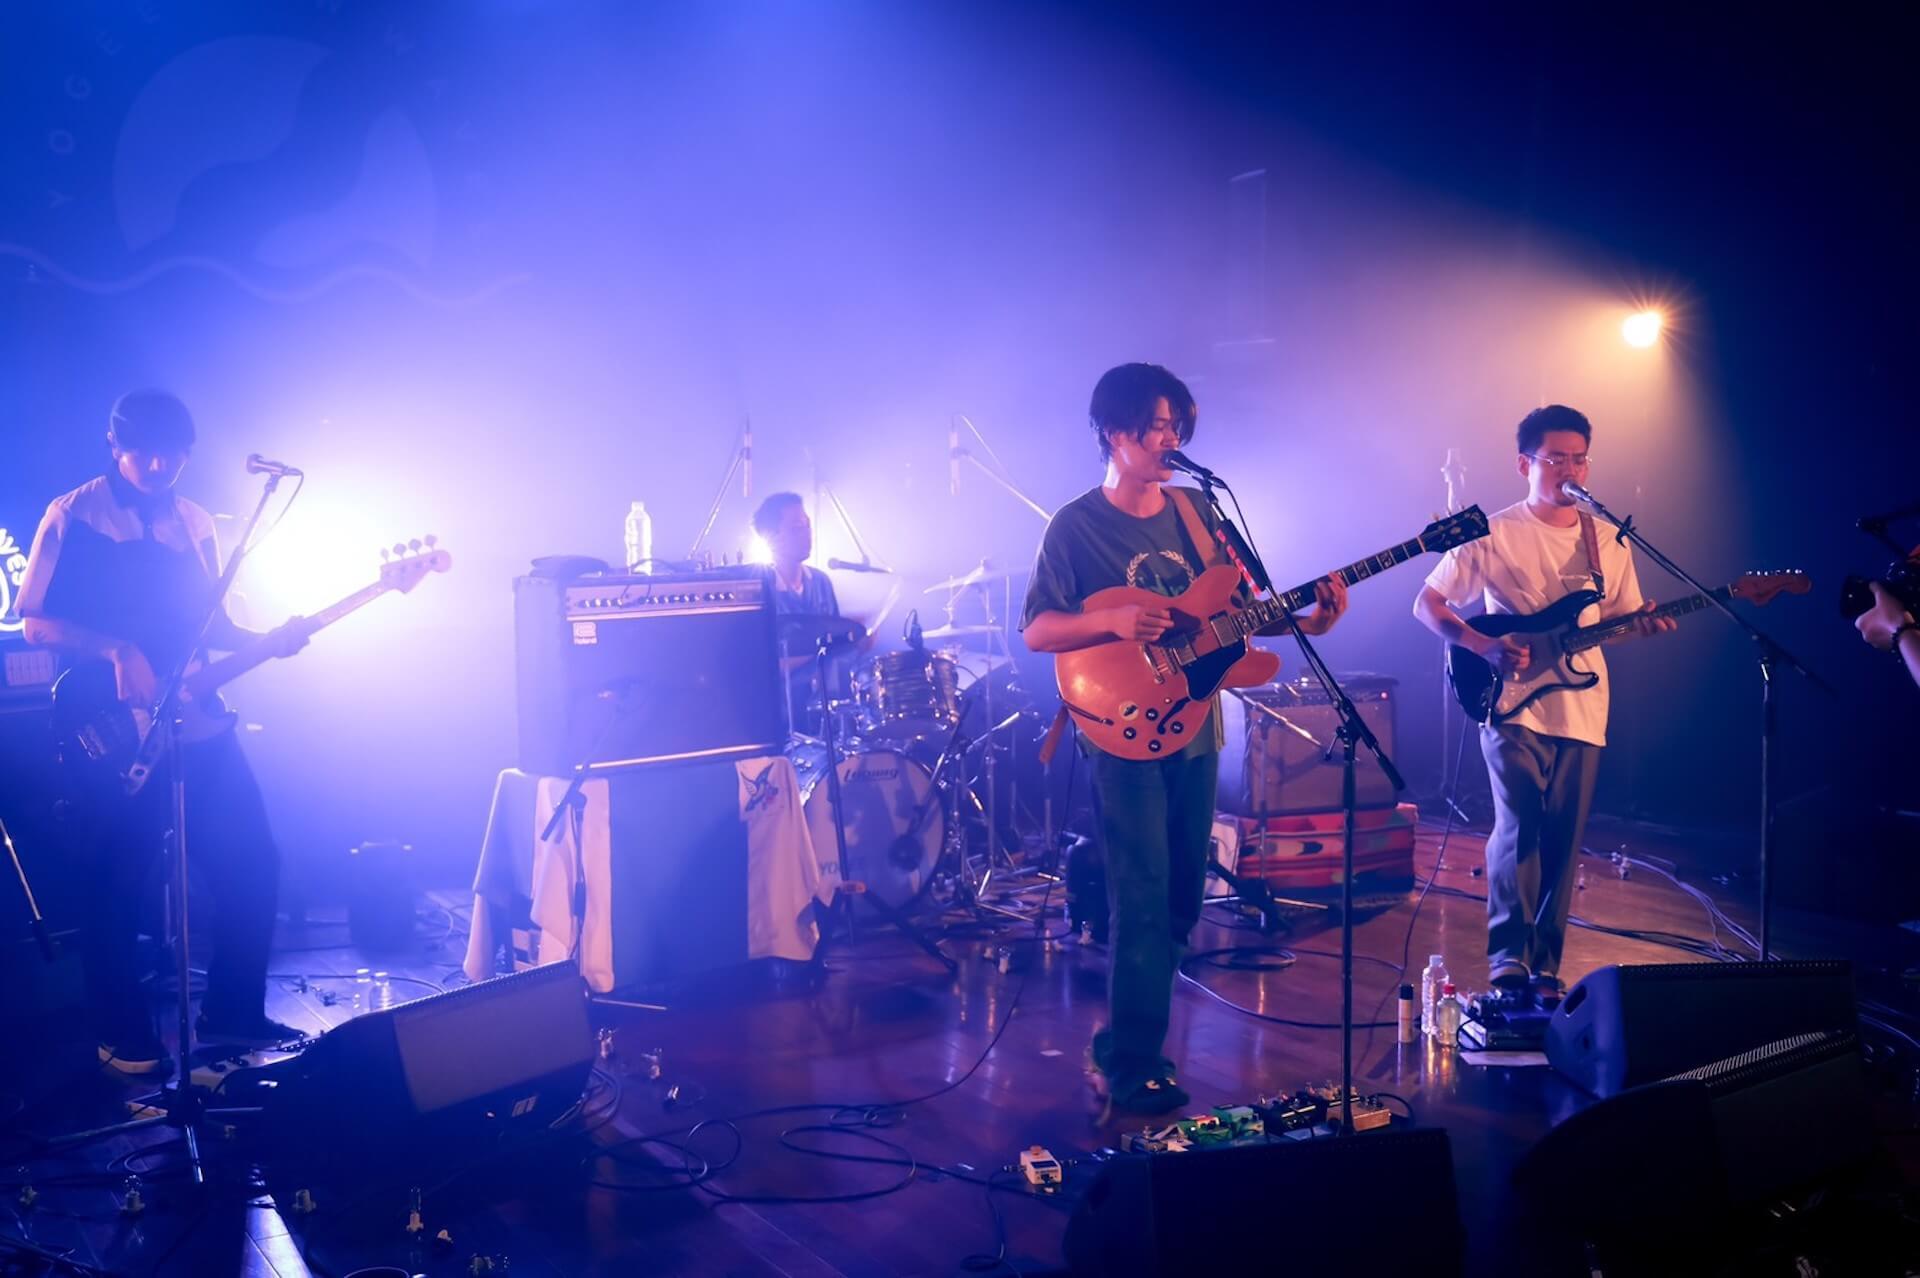 LIVEWIREで配信されたYogee New Wavesのライブ映像が期間限定で見逃し配信中!ライブレポートも到着 music200714_livewire_yogeenewwaves_03